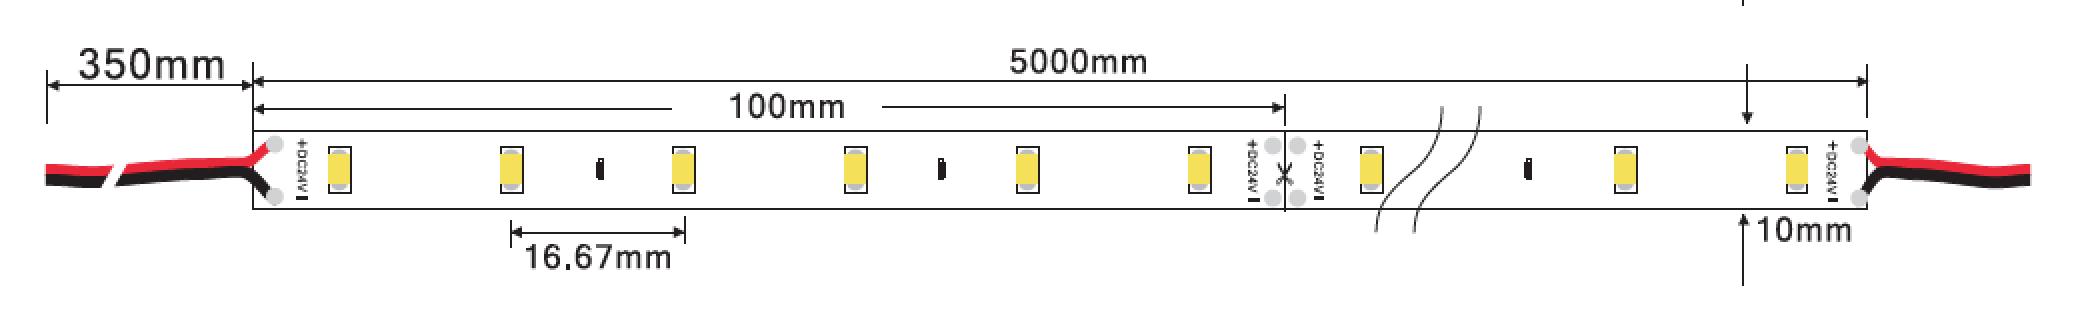 TLT-LX-130050 line drawing